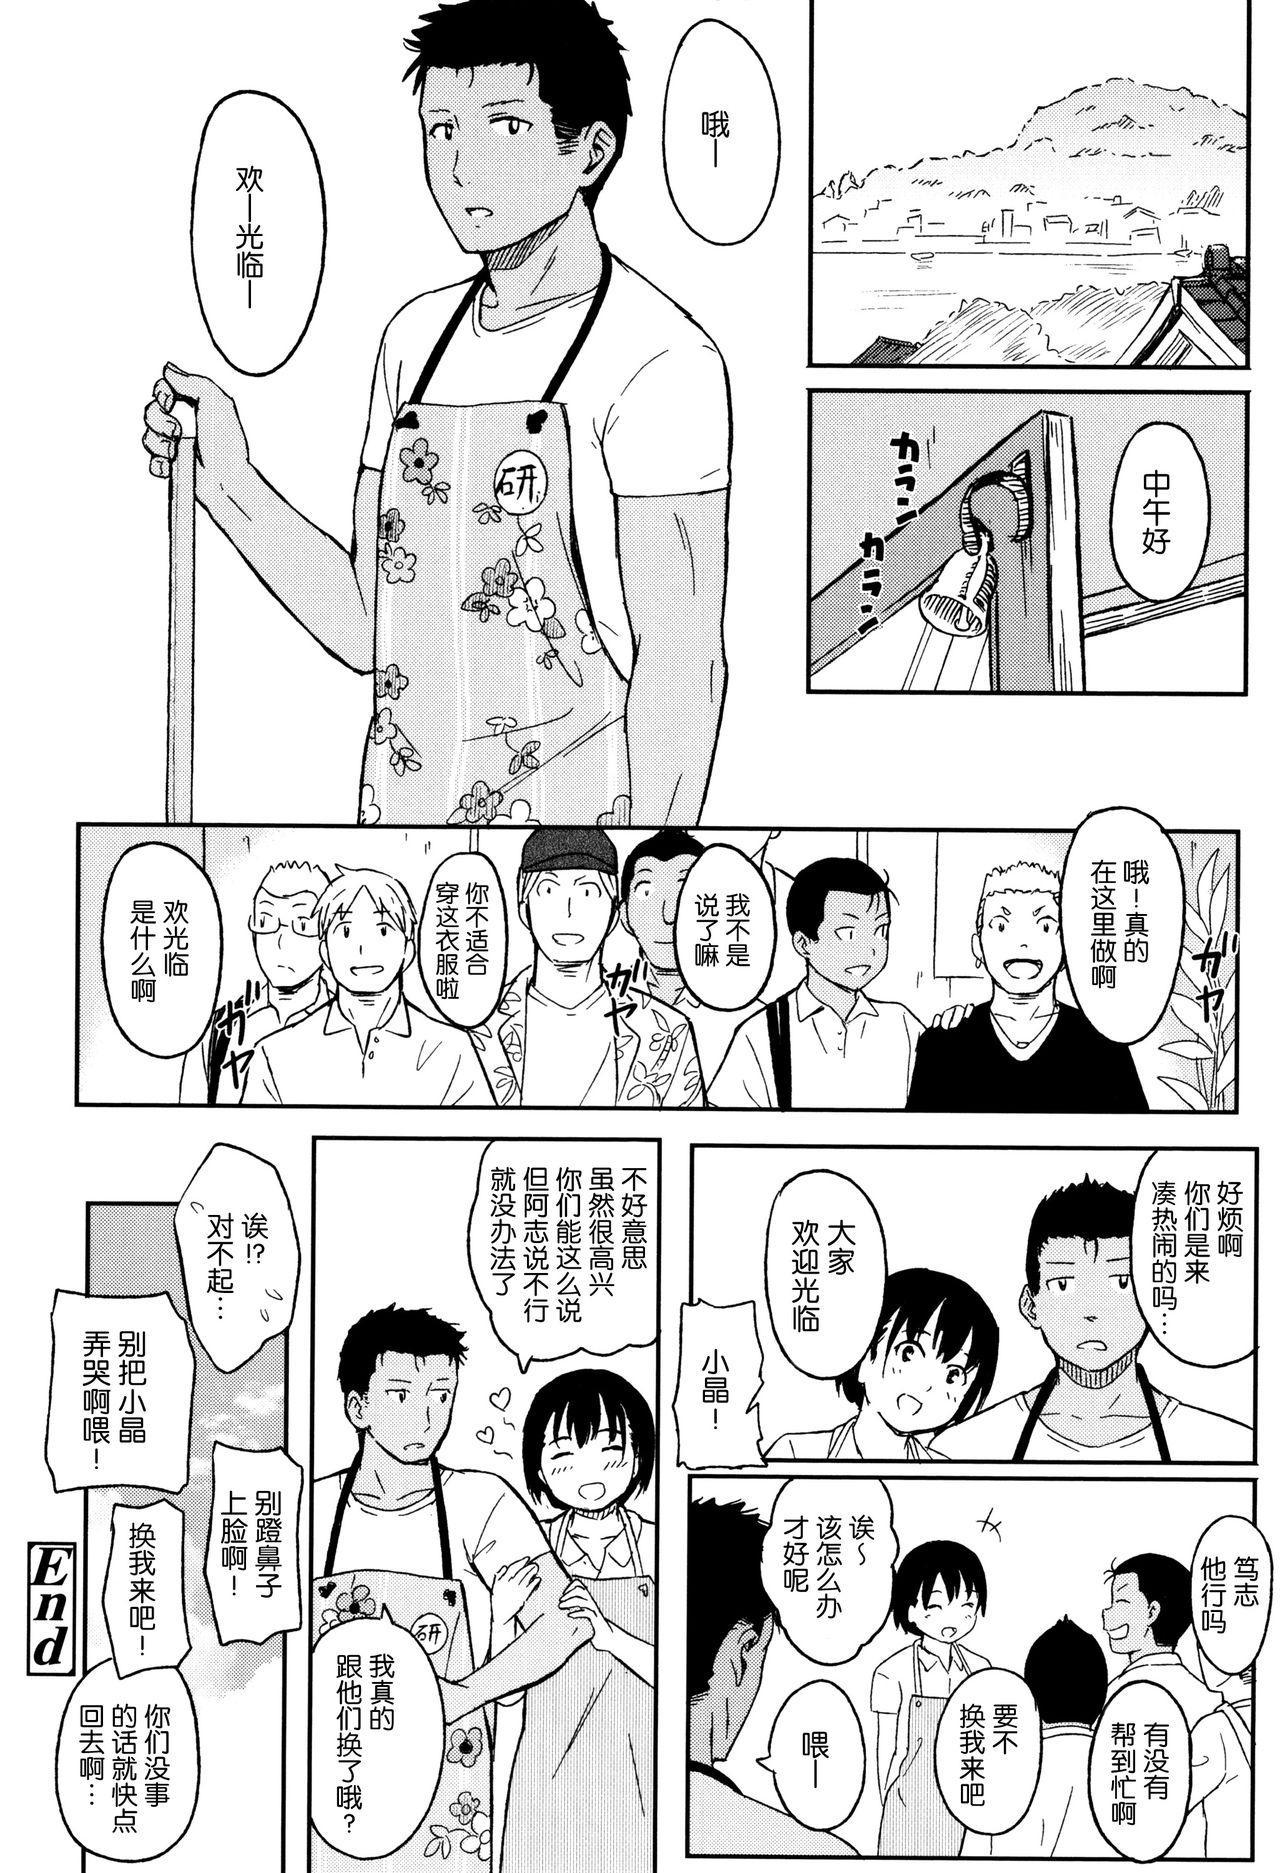 Tokubetsu na Mainichi - Special daily 204